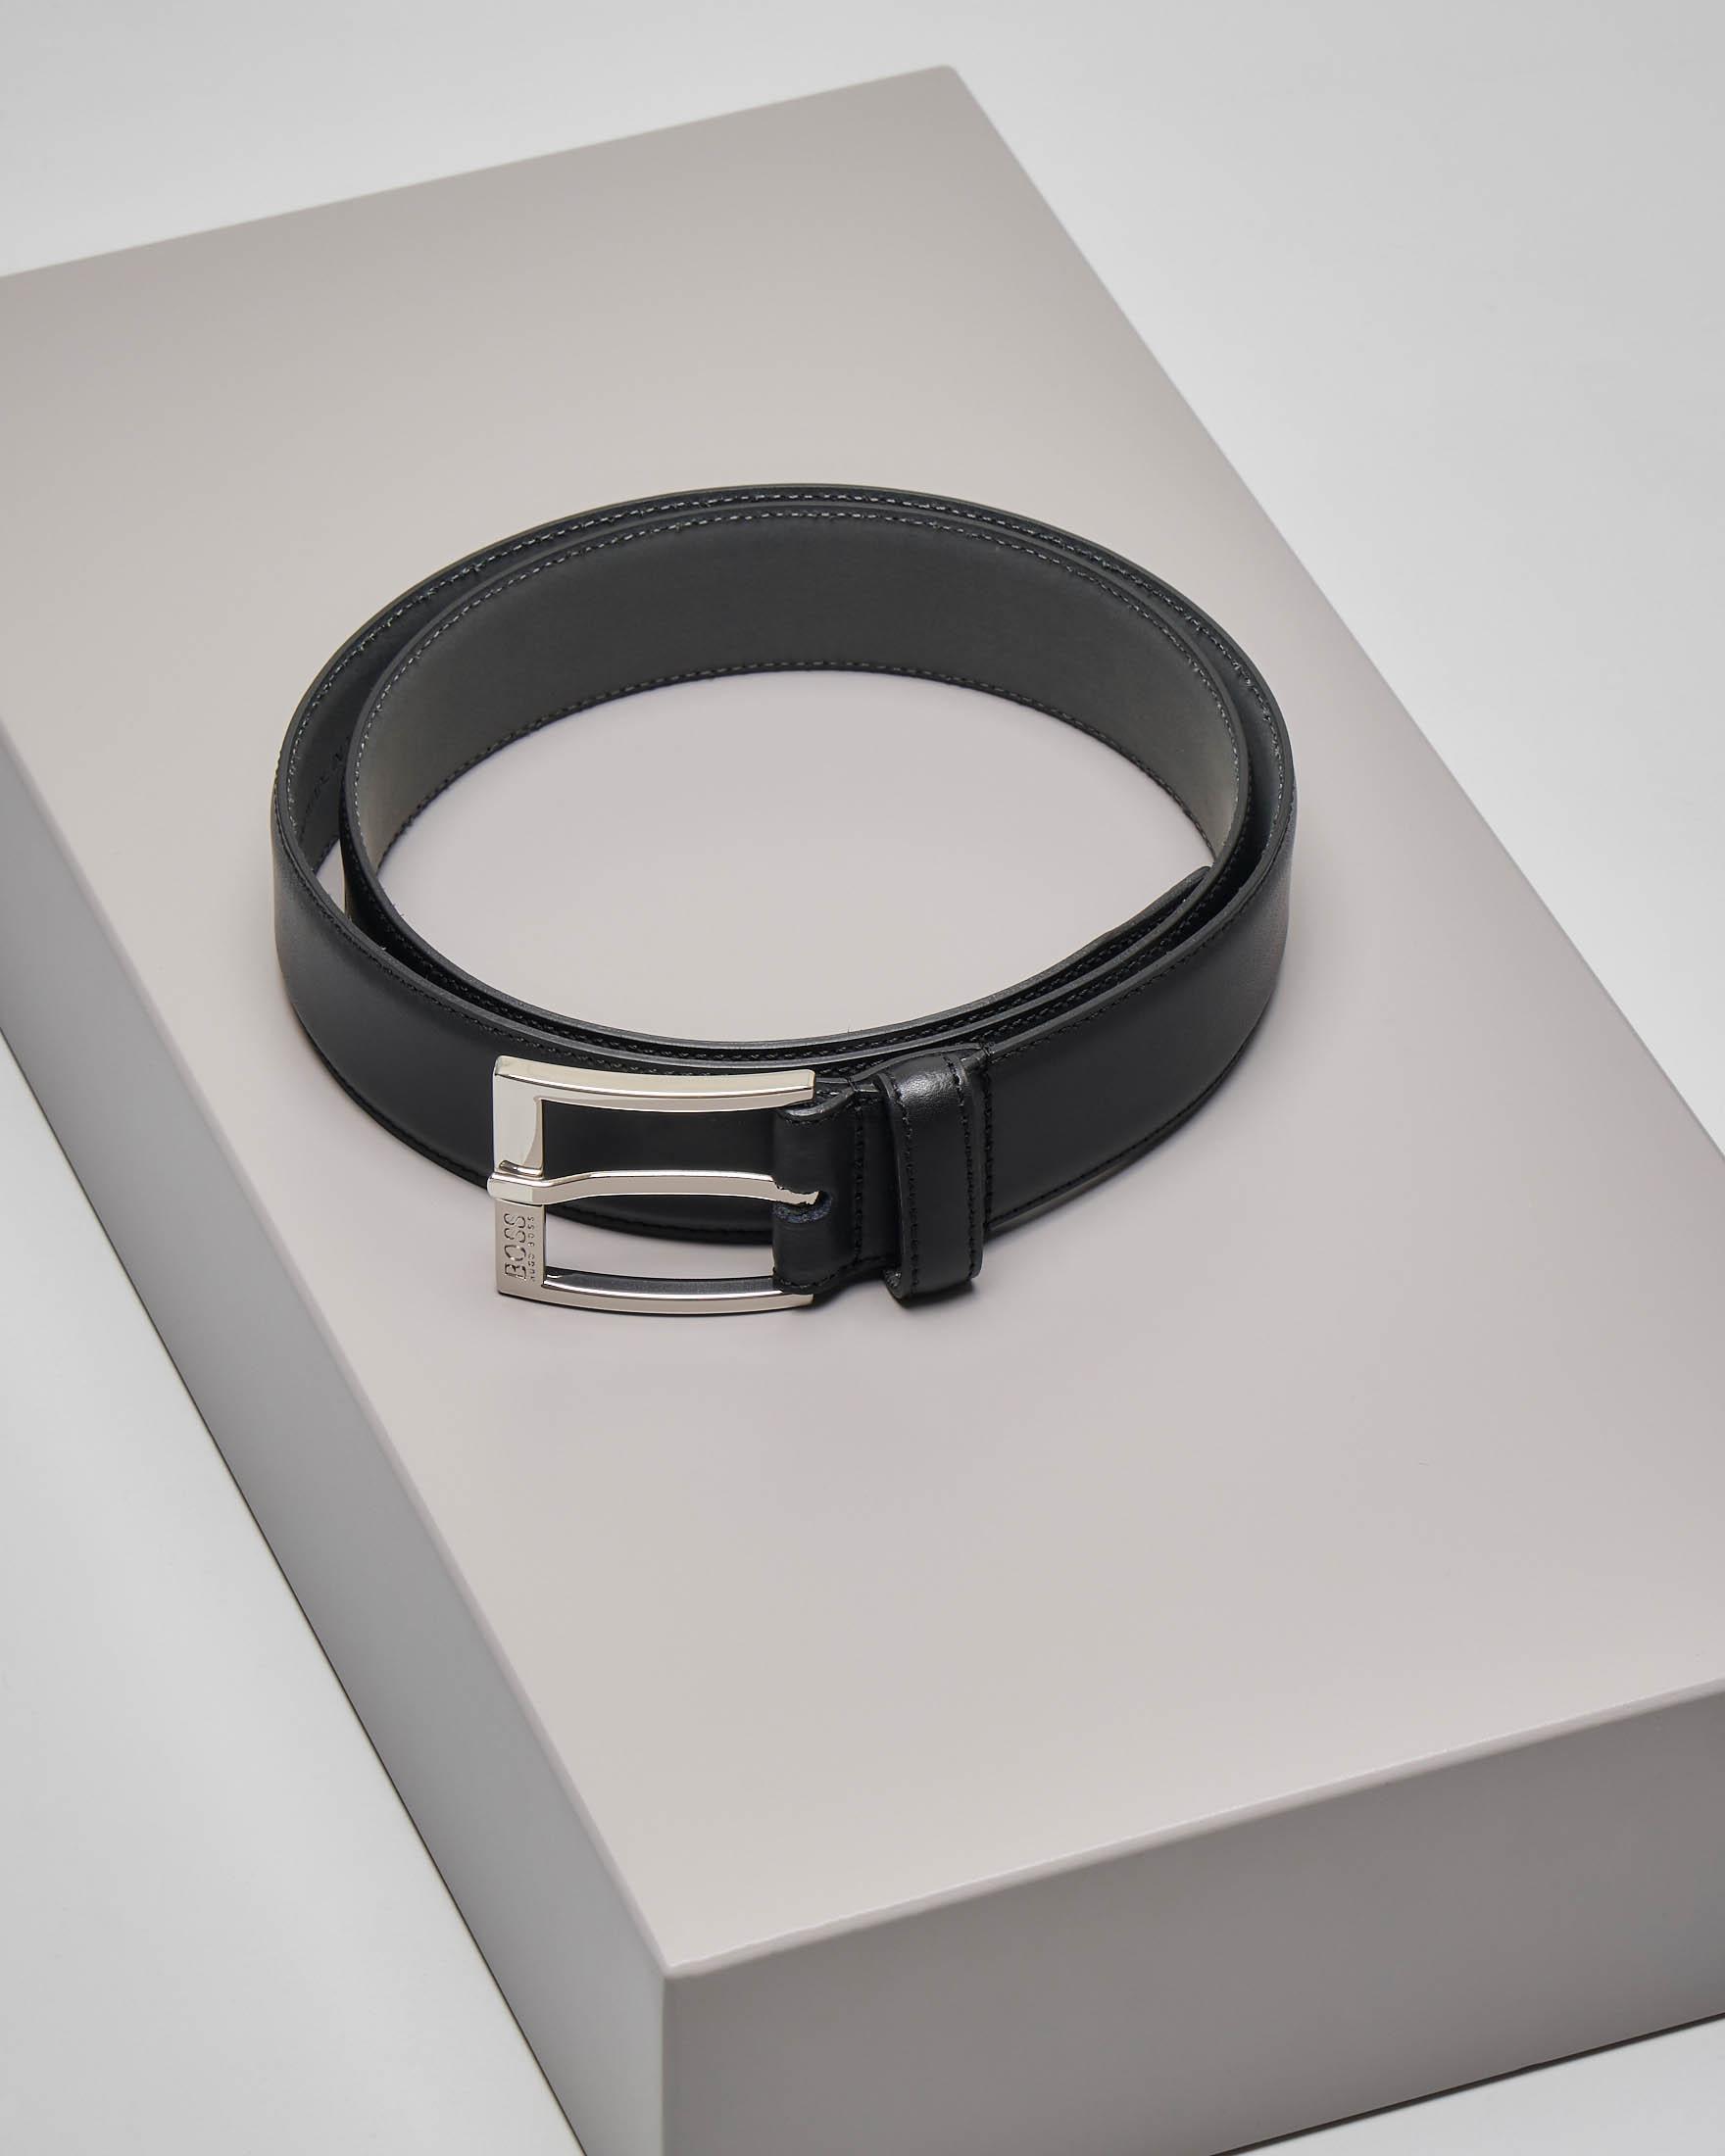 Cintura nera in pelle liscia con cuciture a vista